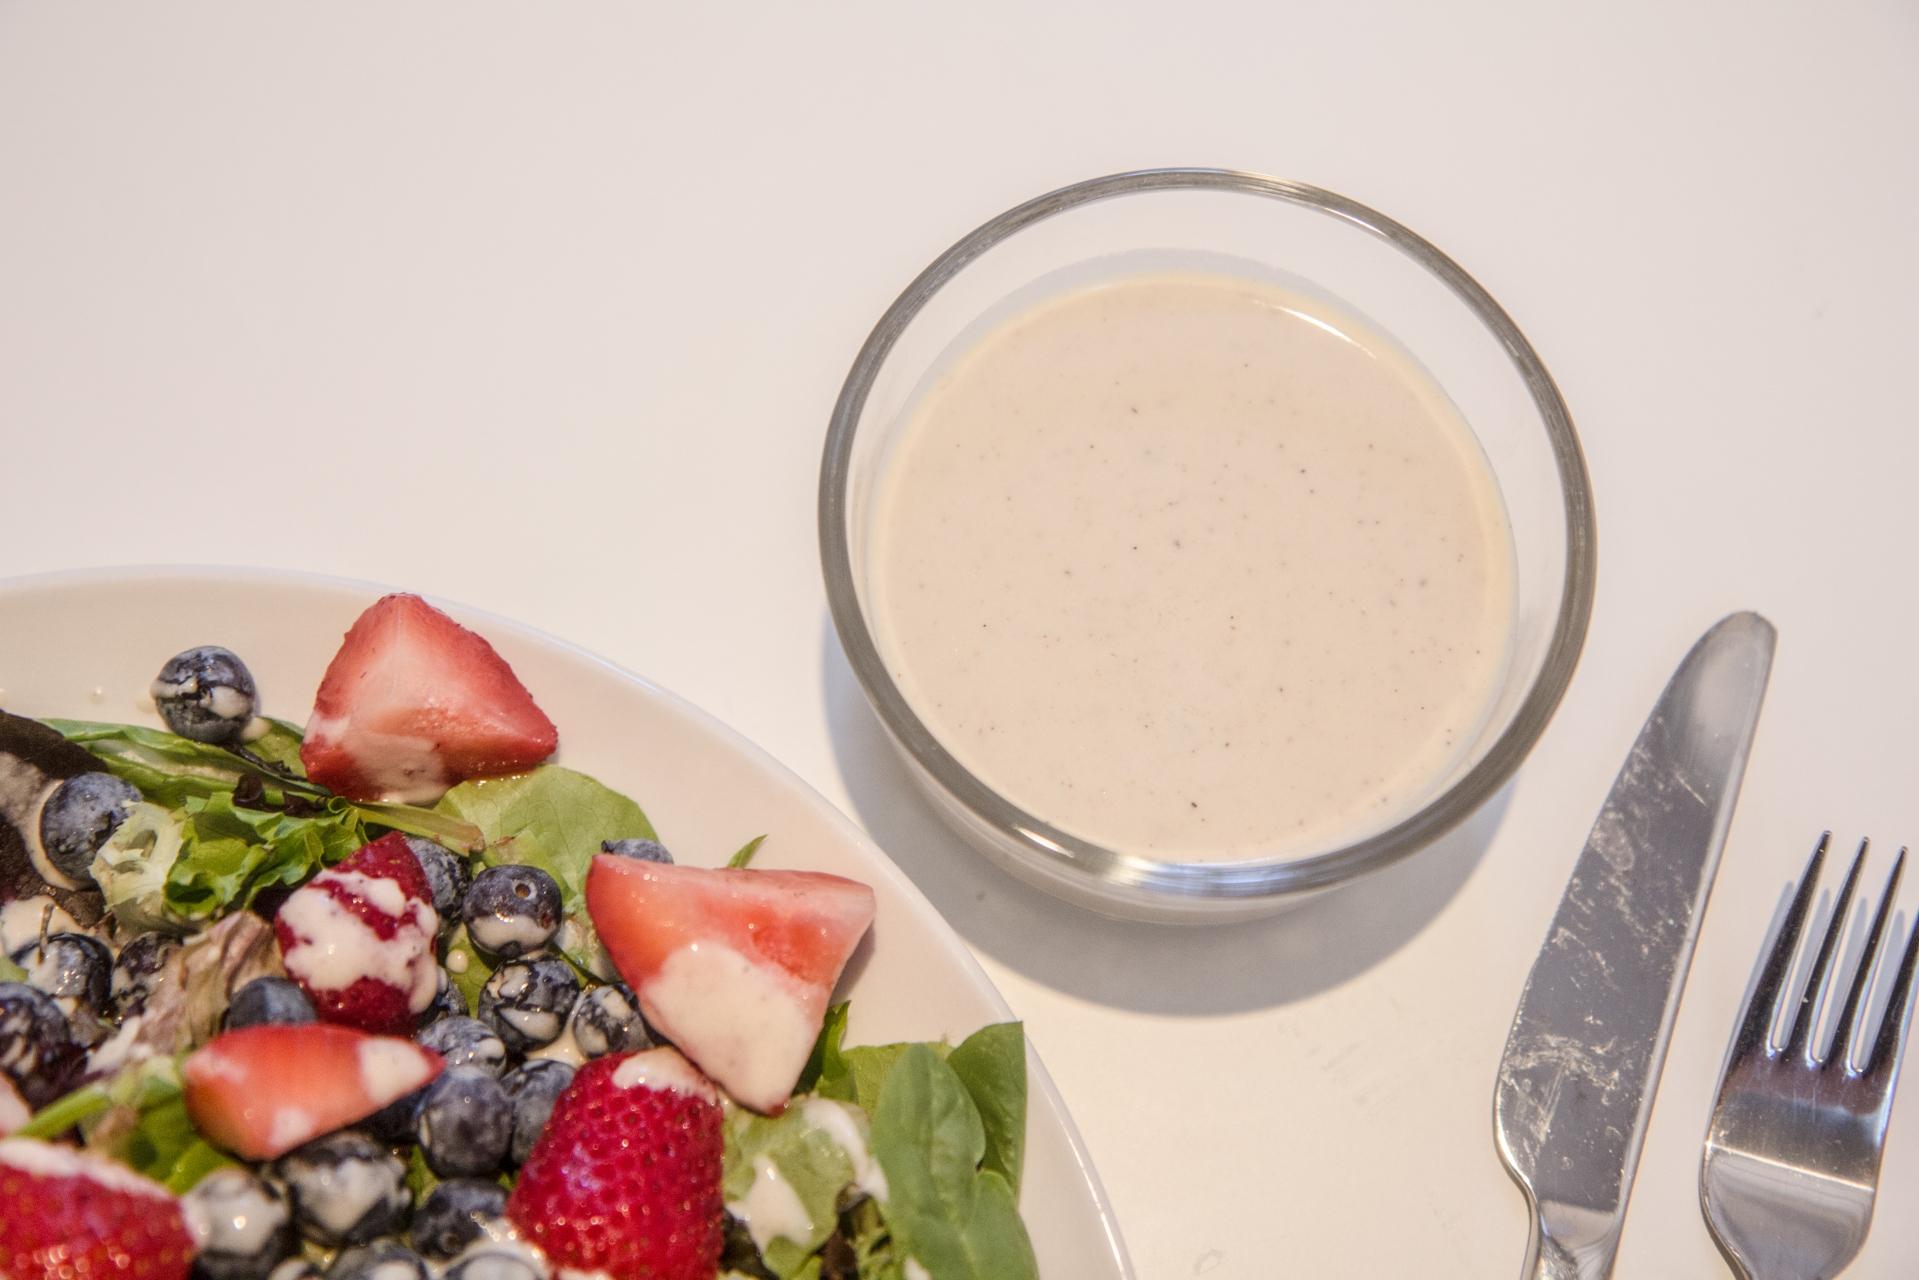 Paleo Vegan Salad with Creamy Tahini Dressing